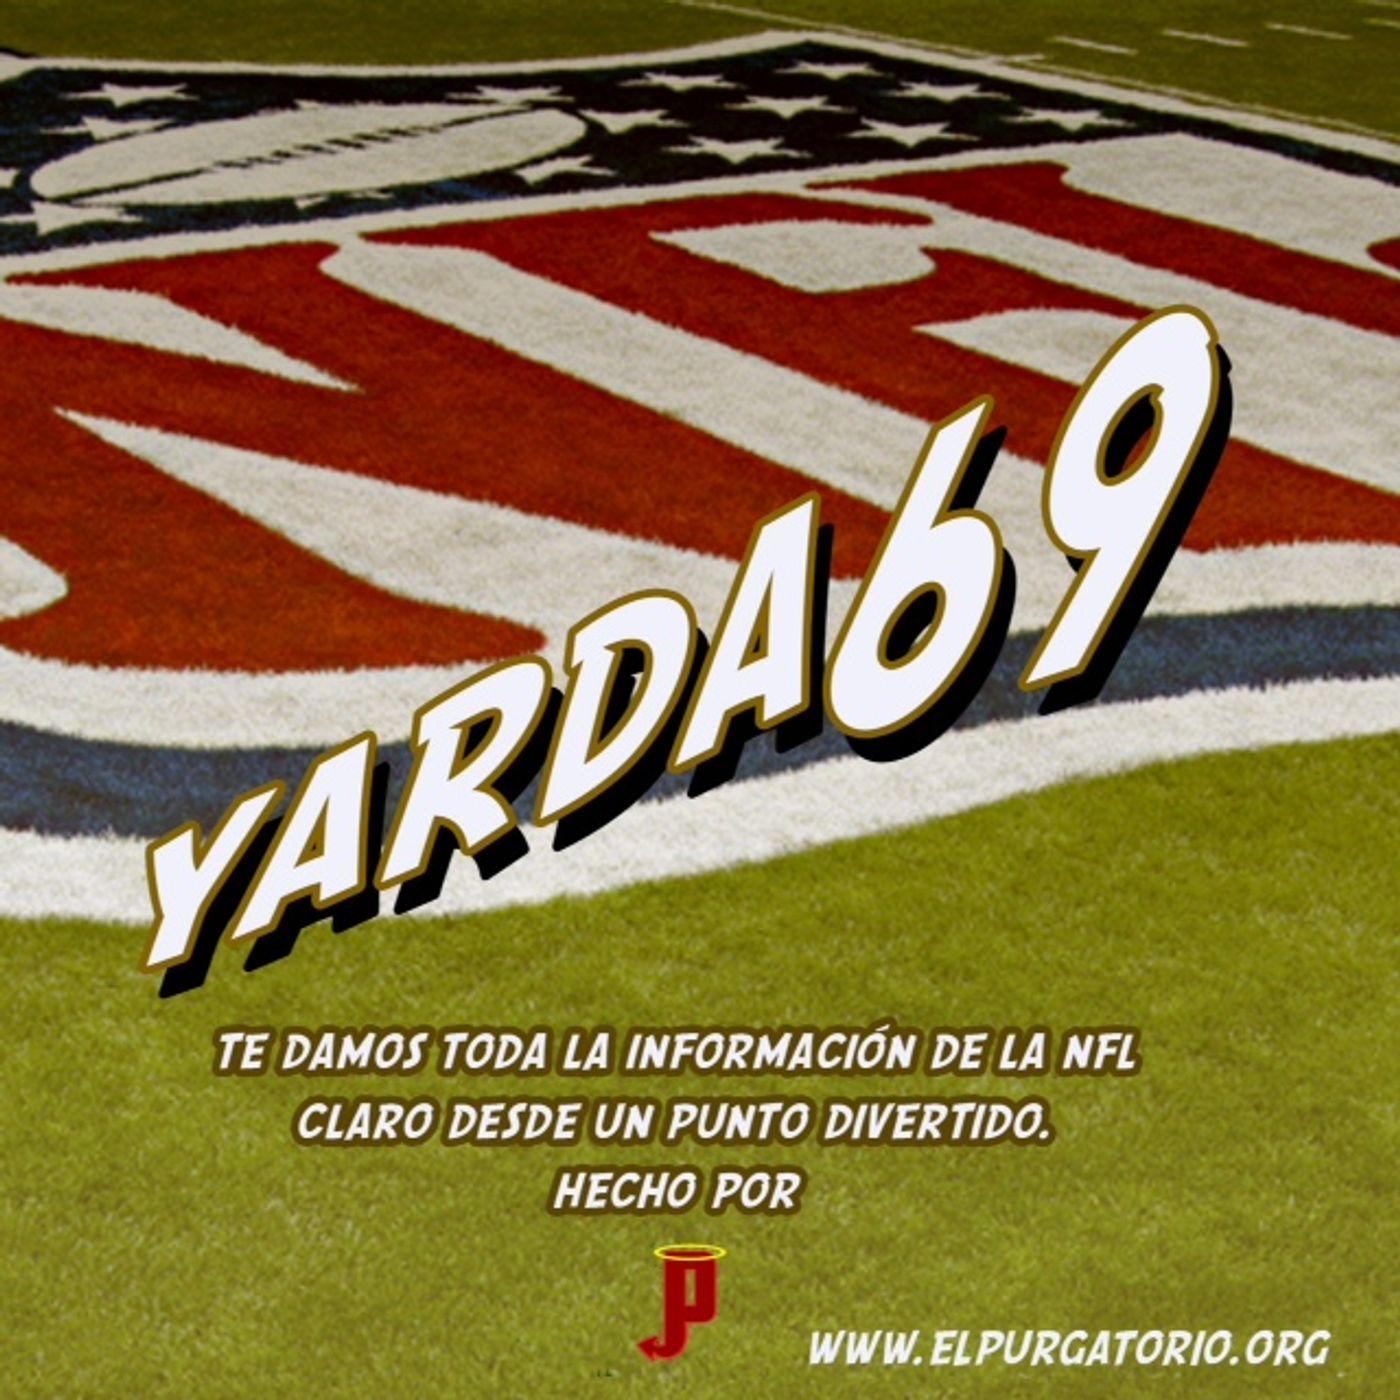 Yarda 69 NFL